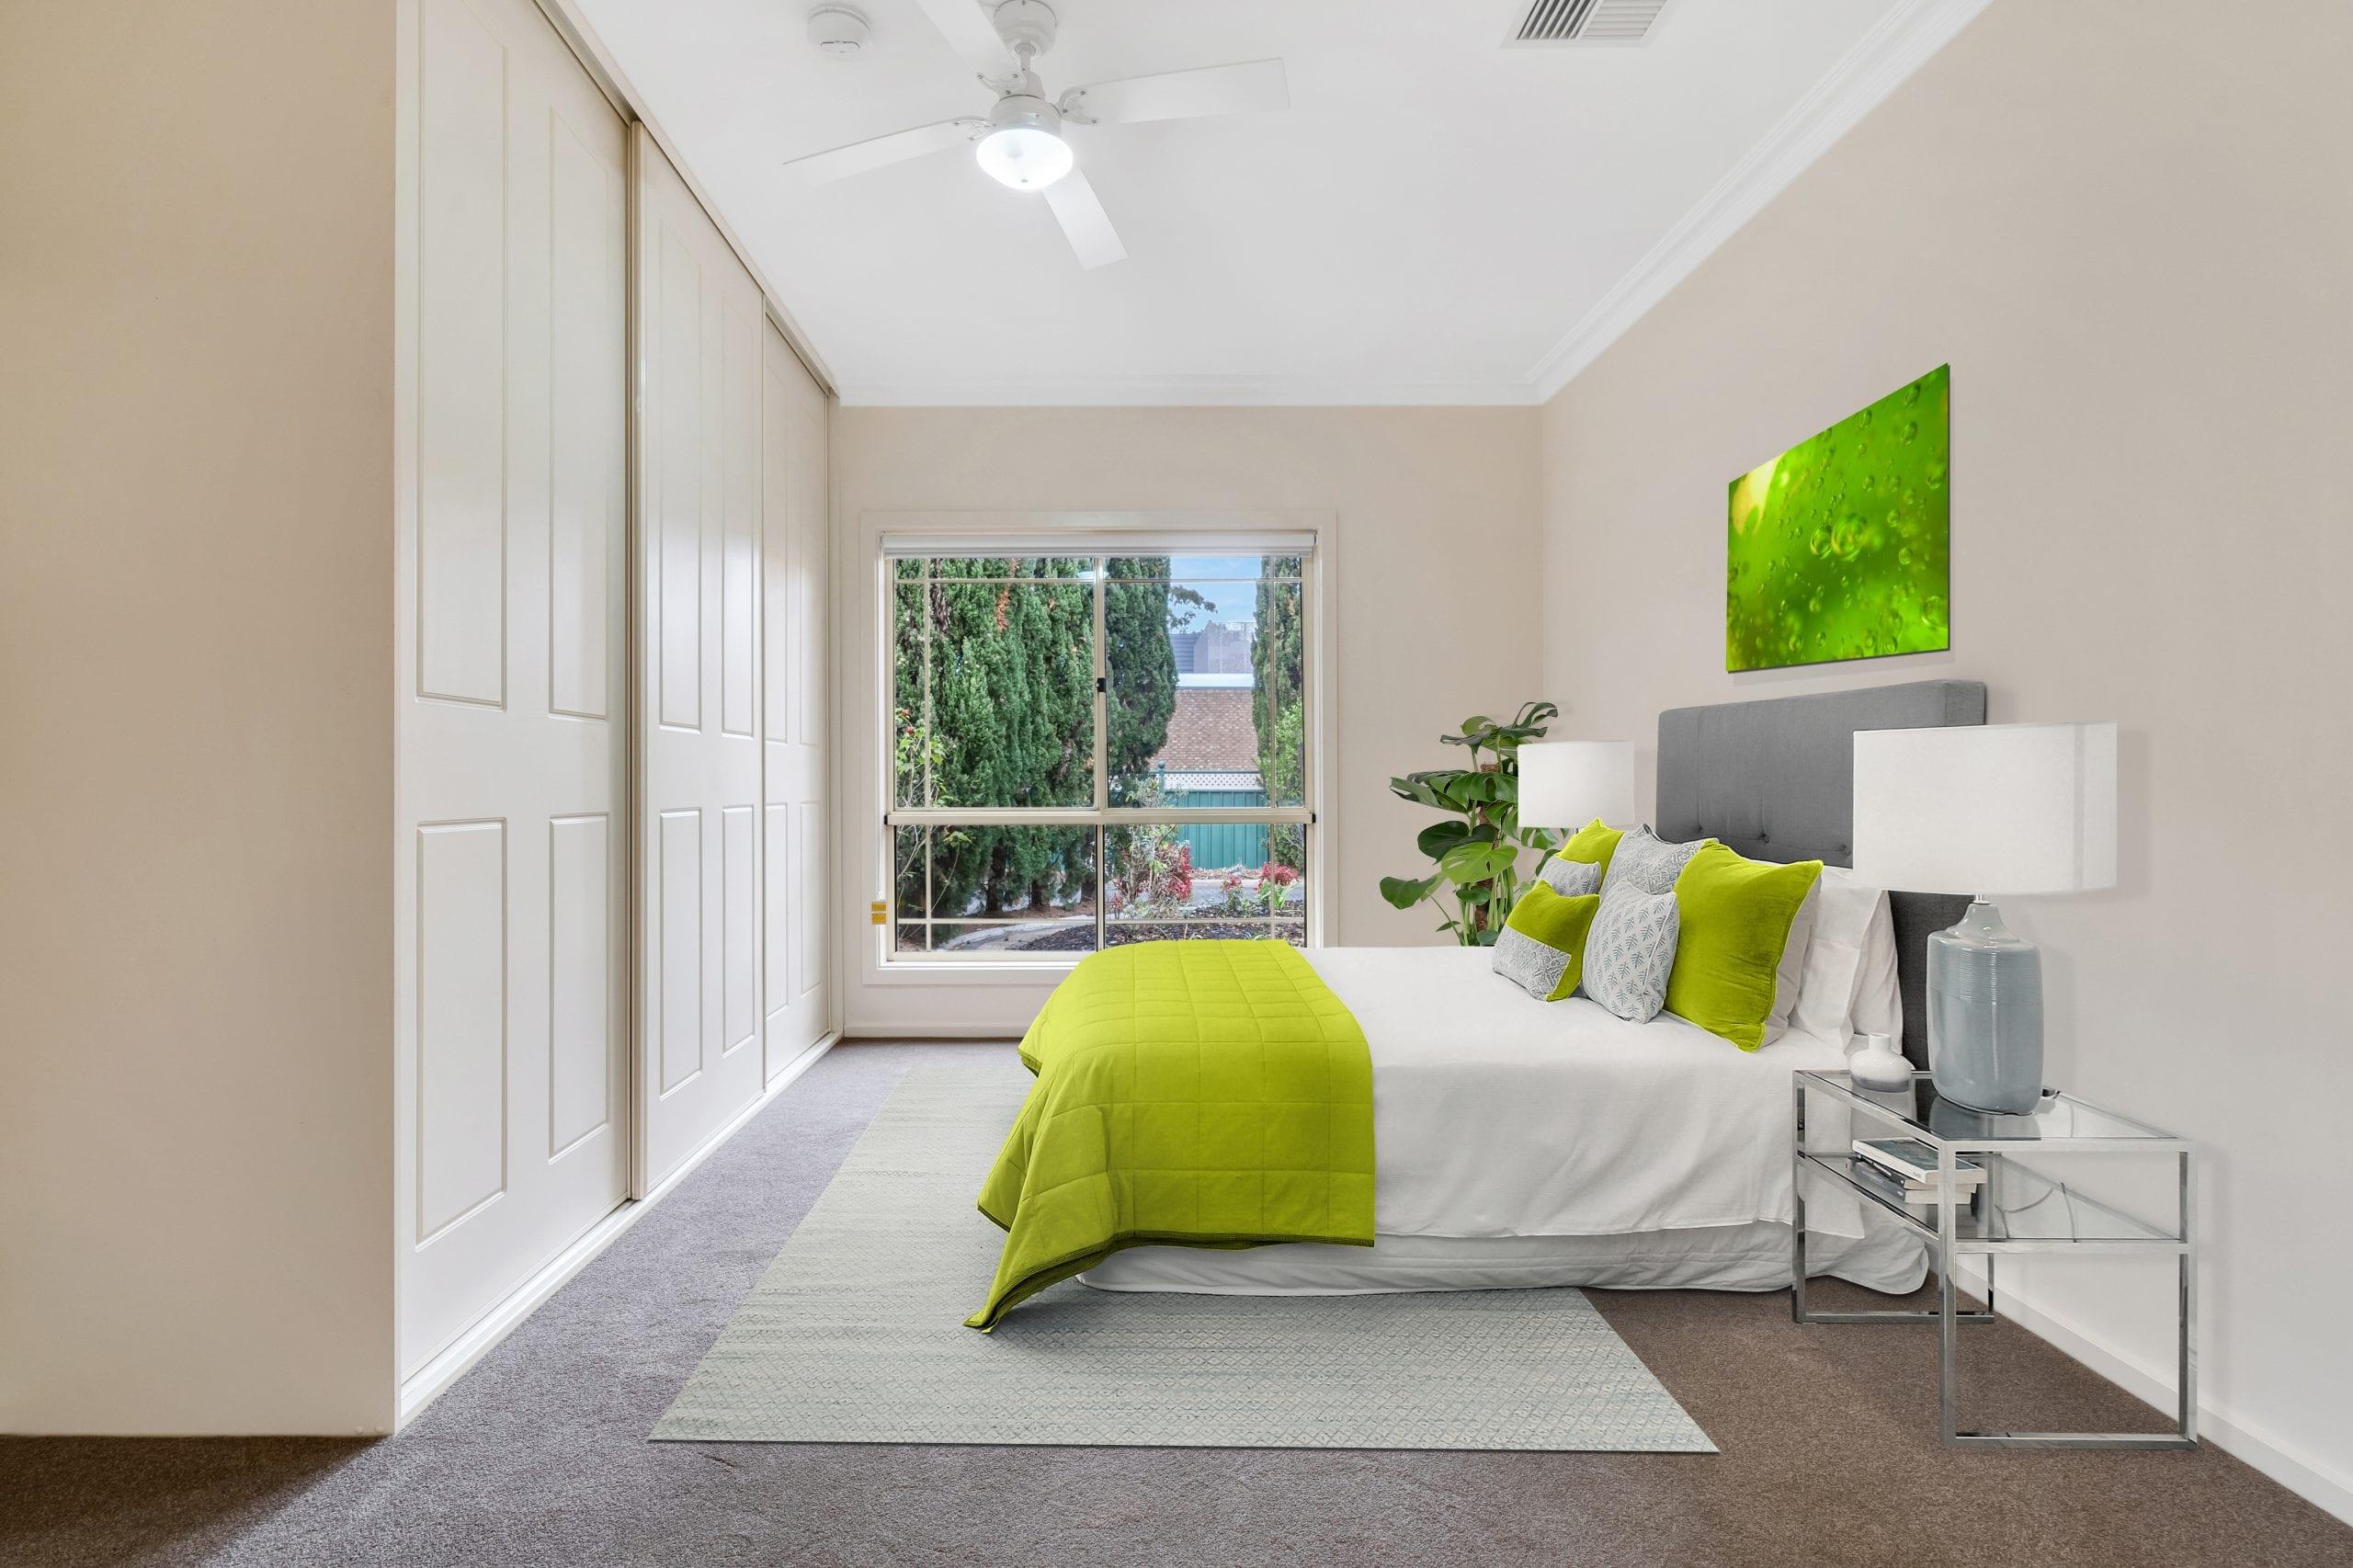 U4 Main Rd - Main Bedroom (furnished)